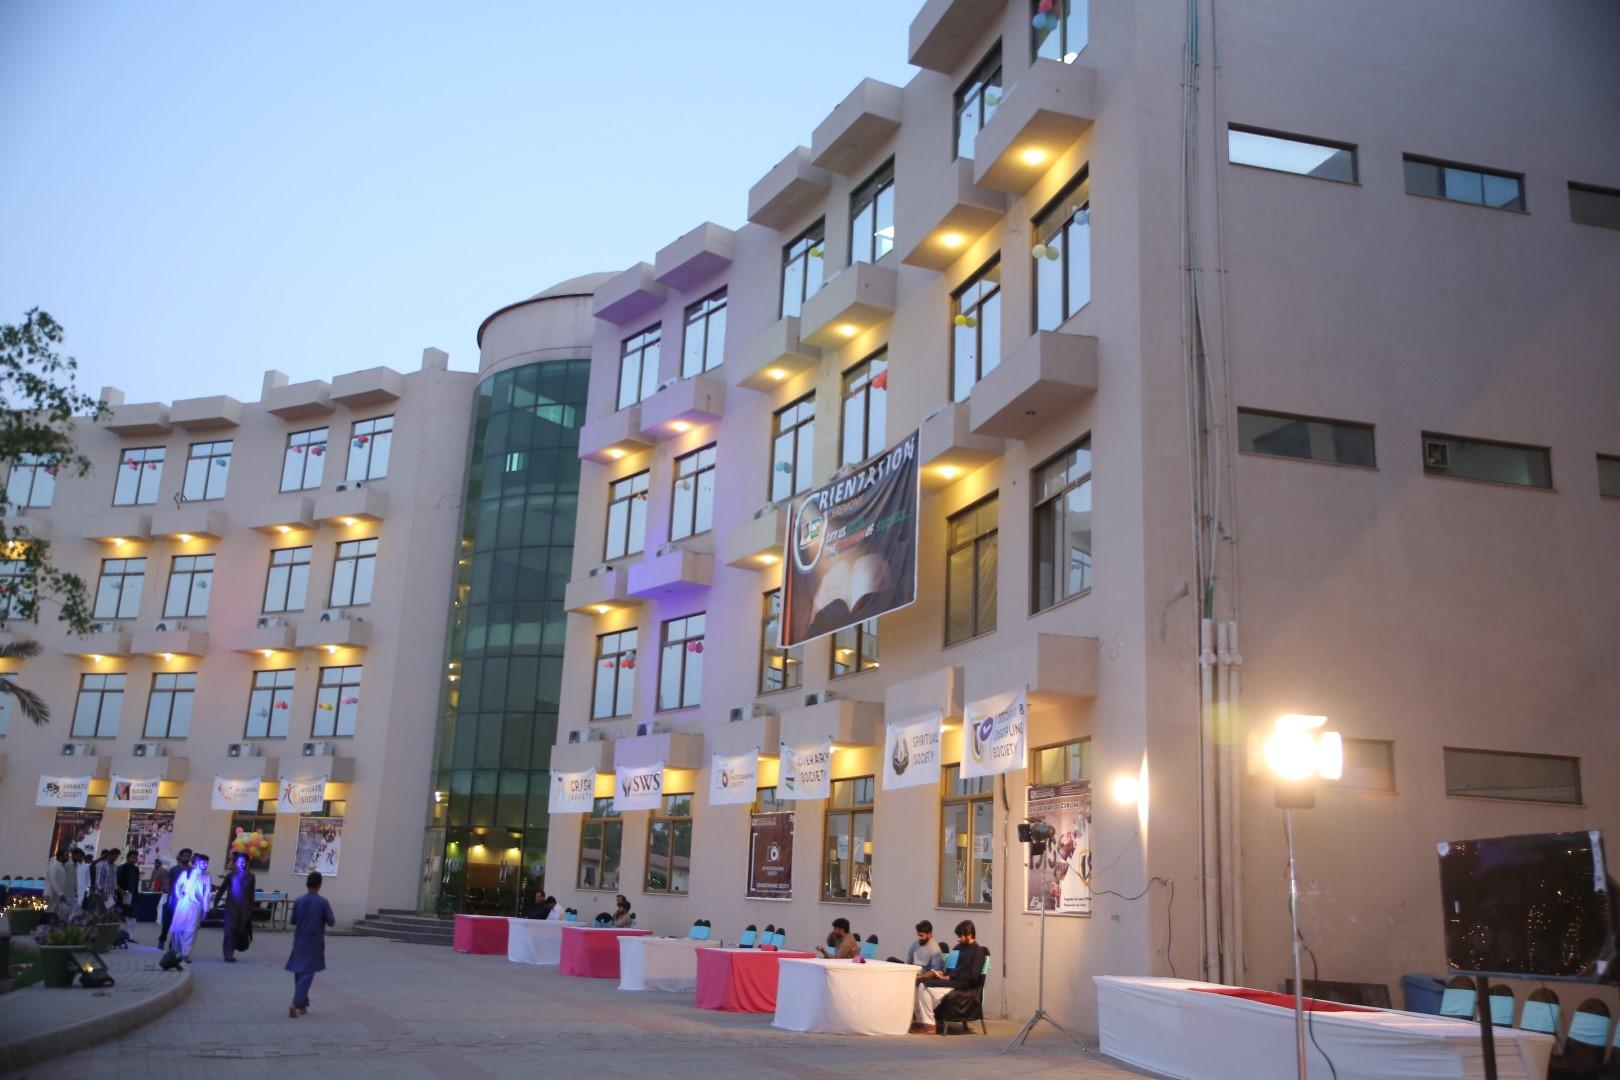 Institute of Southern Punjab (ISP), Multan - Jaamiah.com 2021